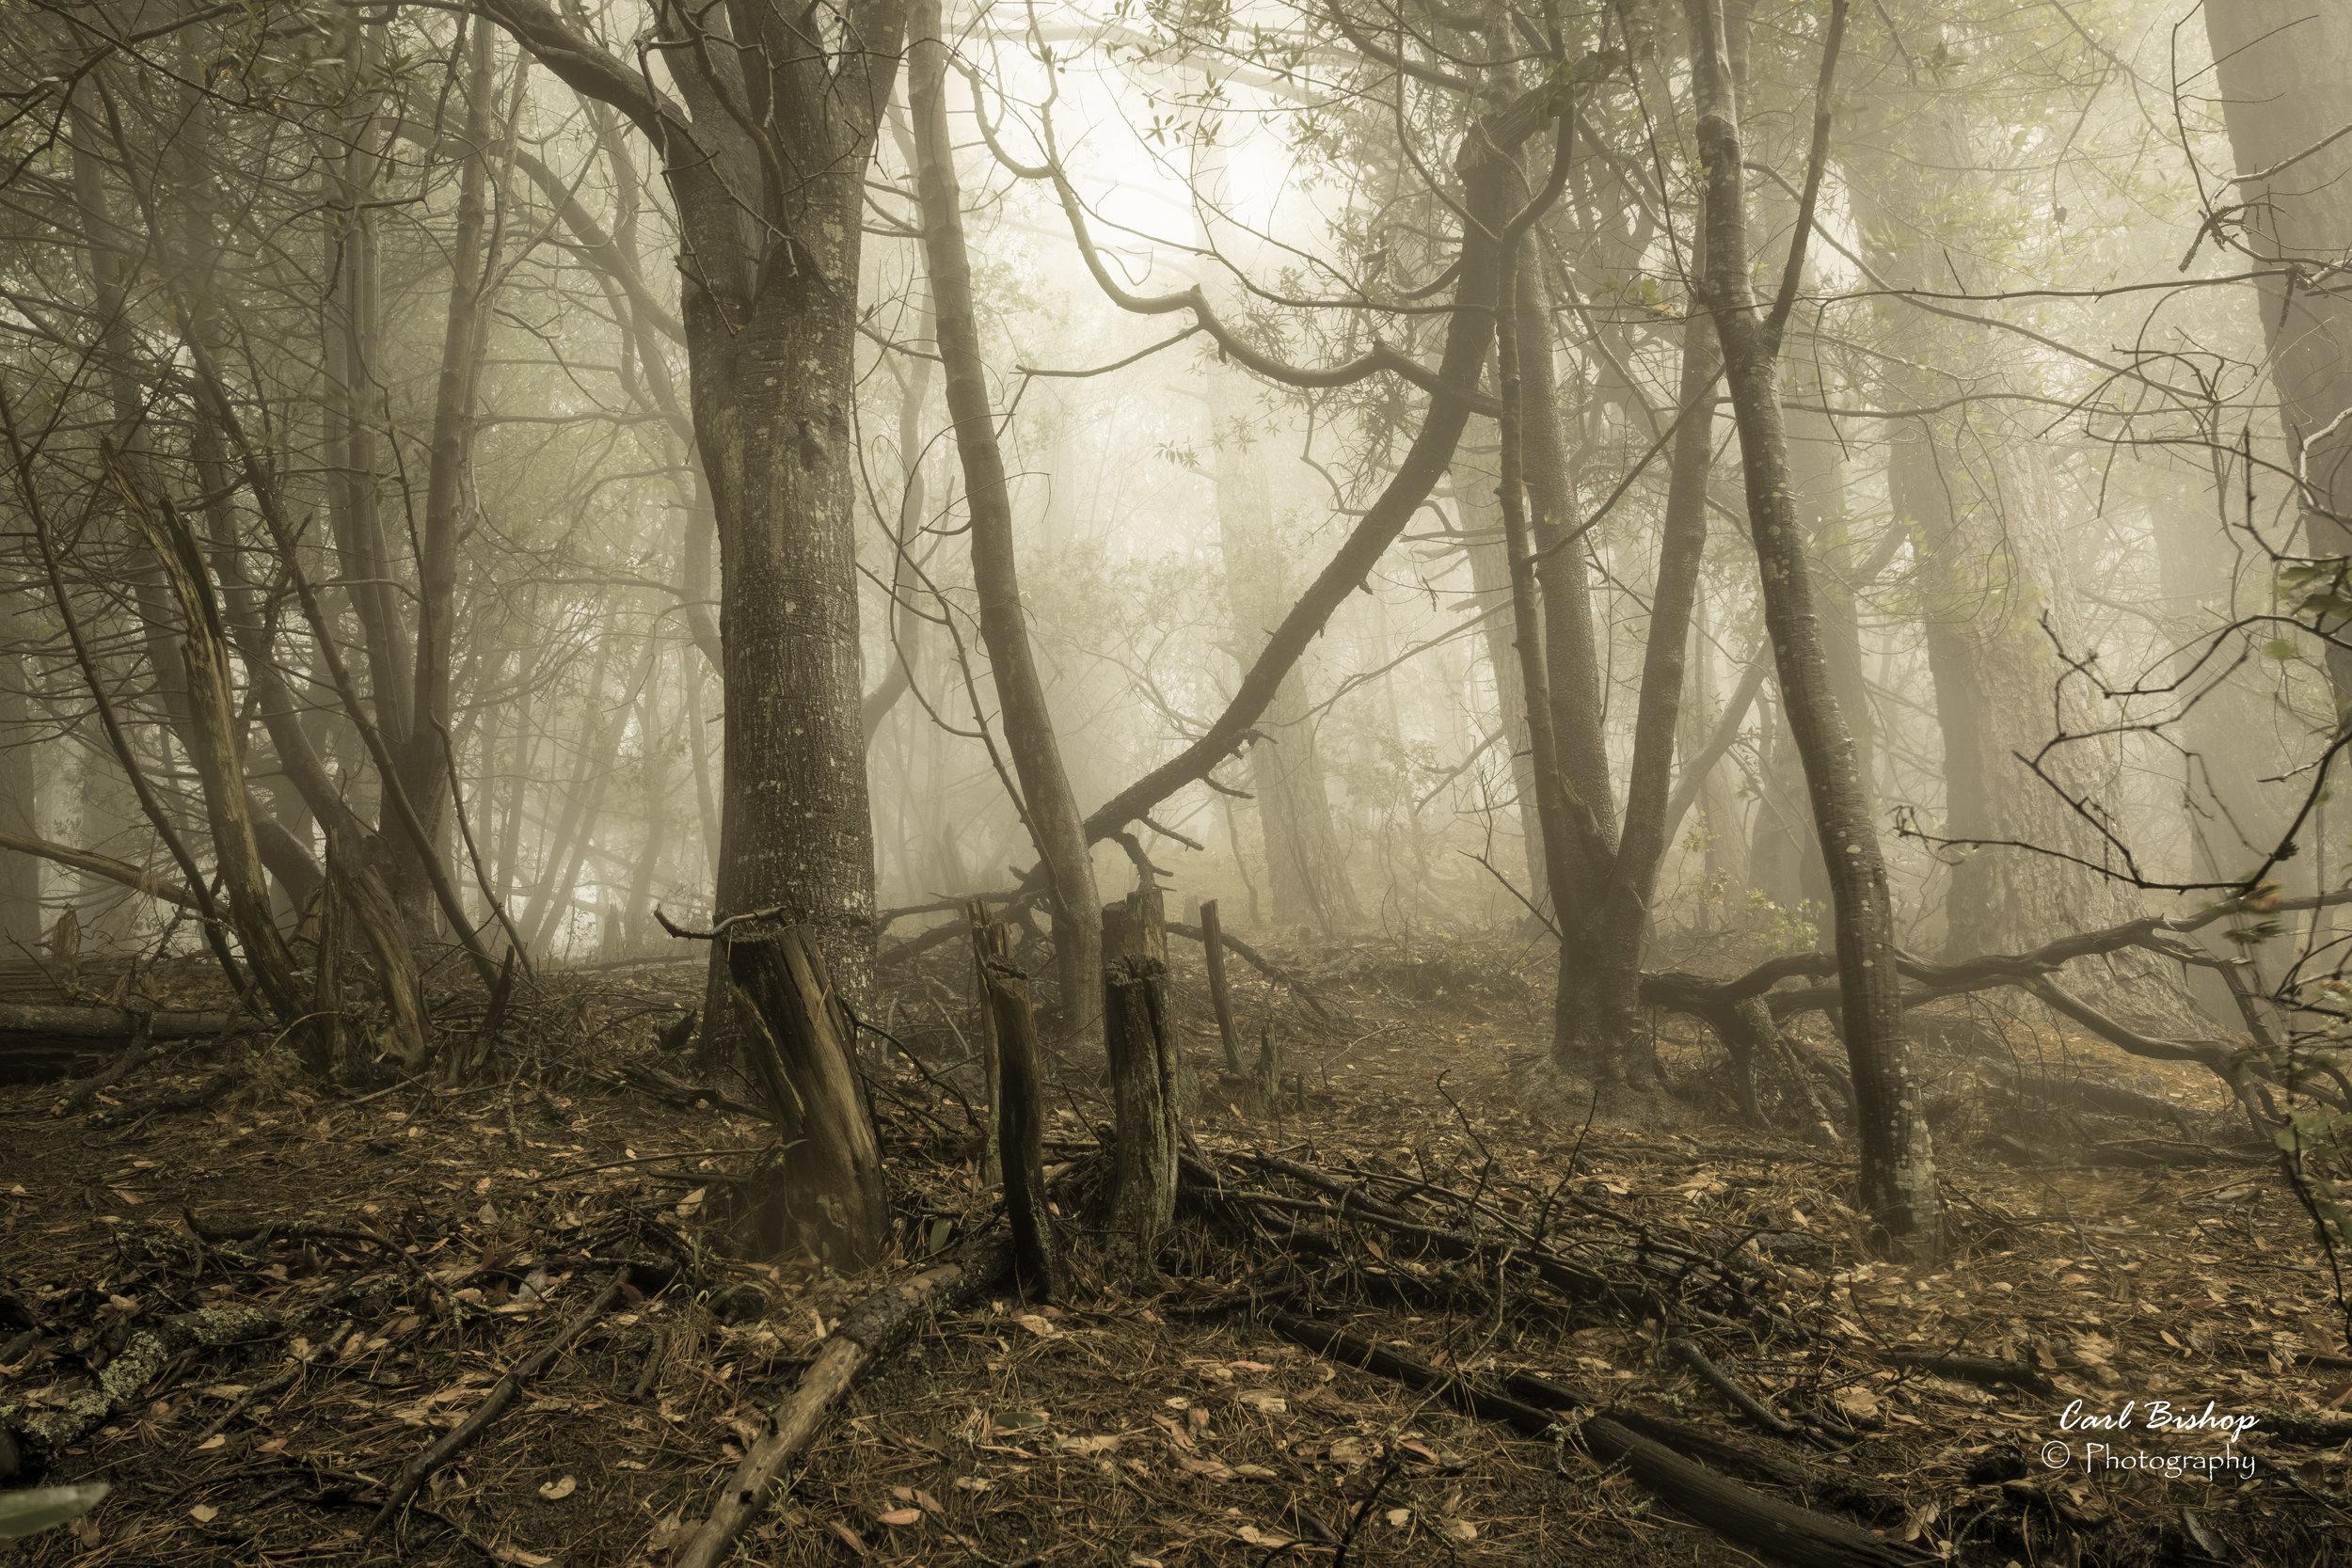 GloomywoodsLRAgedWM.jpg